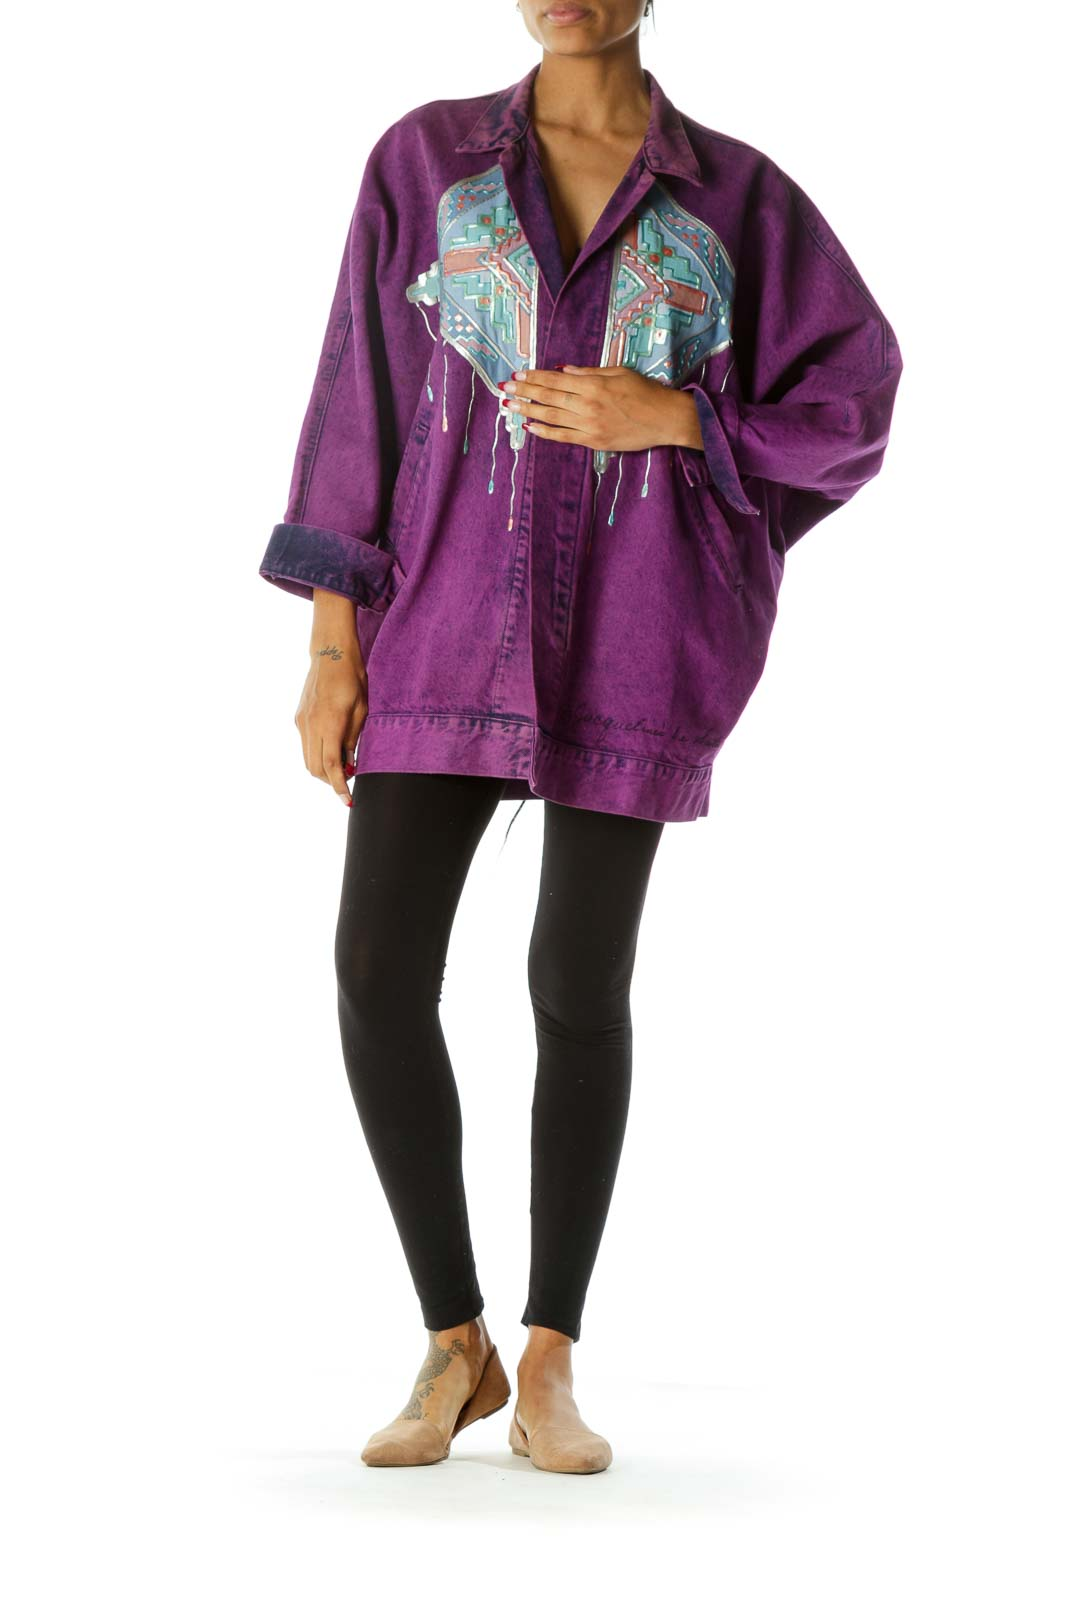 Purple Blue Pink Oversize Front and Back Design Pocketed Vintage Denim Jacket with Signature on Waist